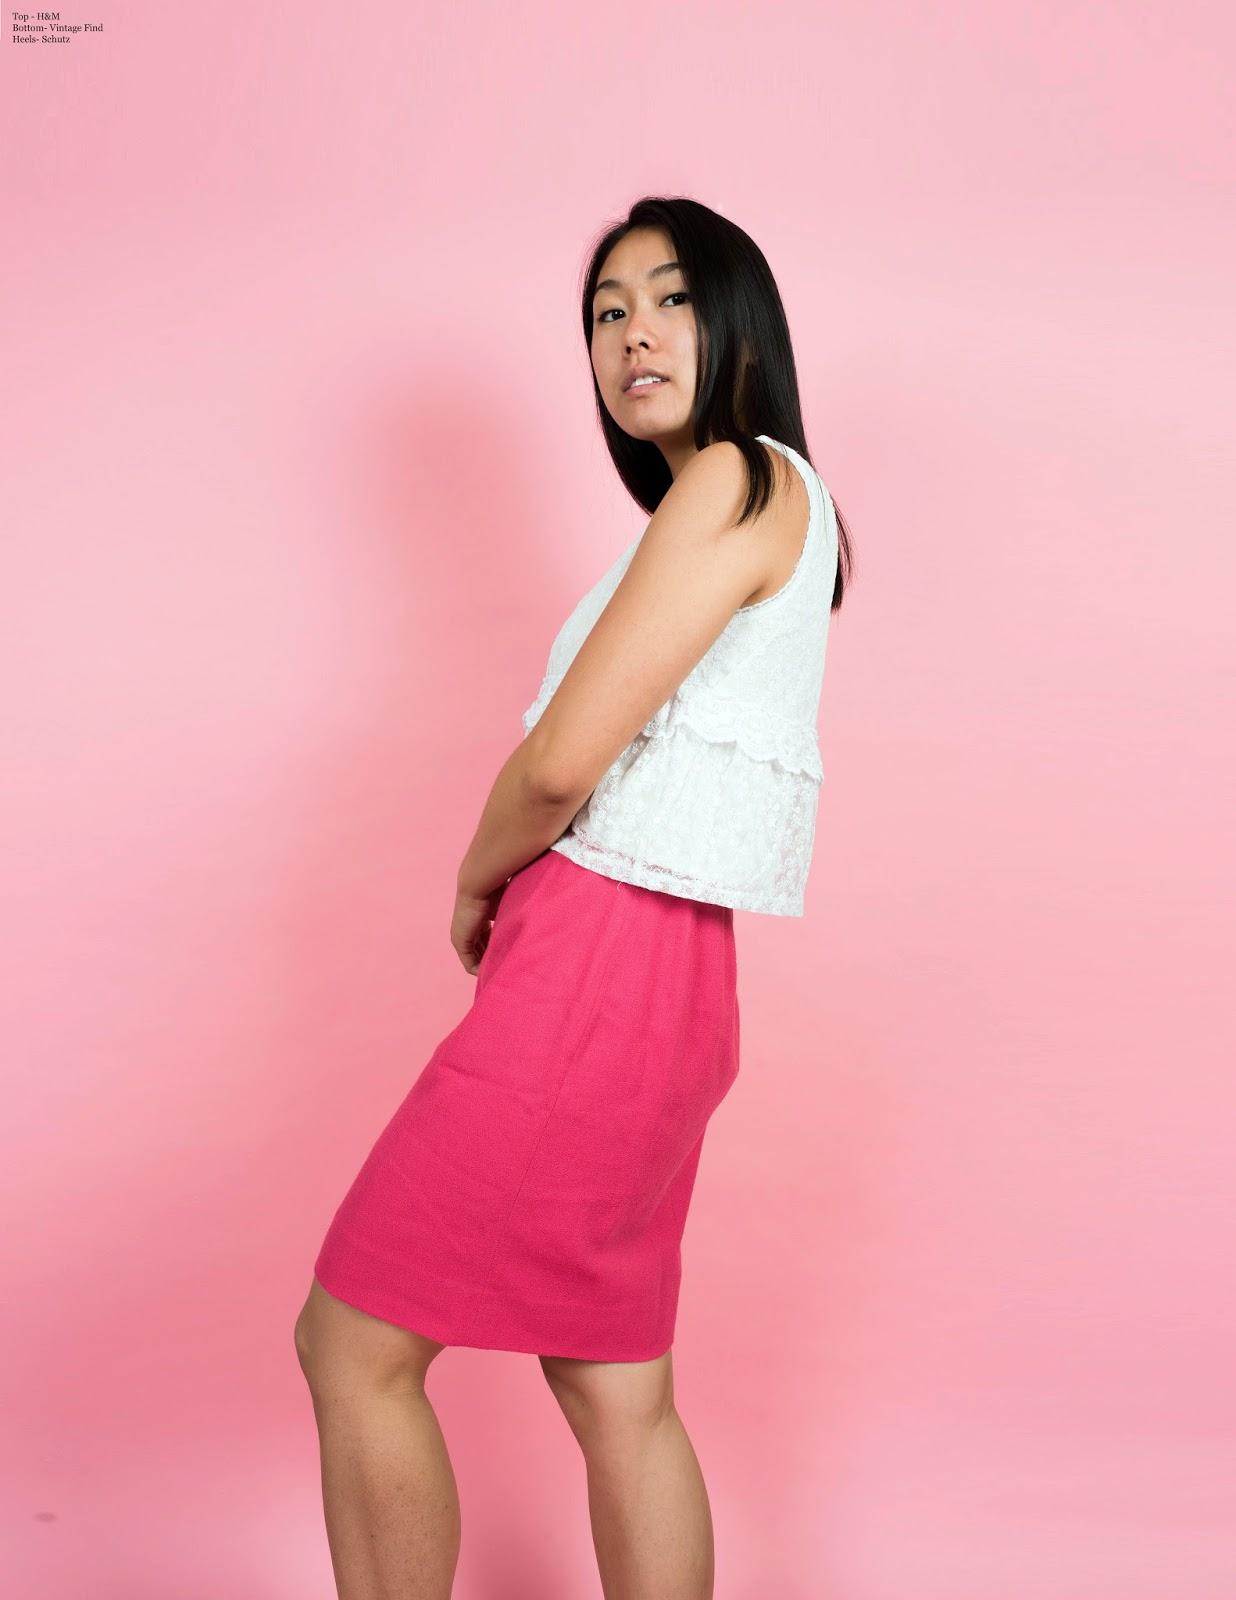 Blushing   Summer Fashion   Sammy Huynn